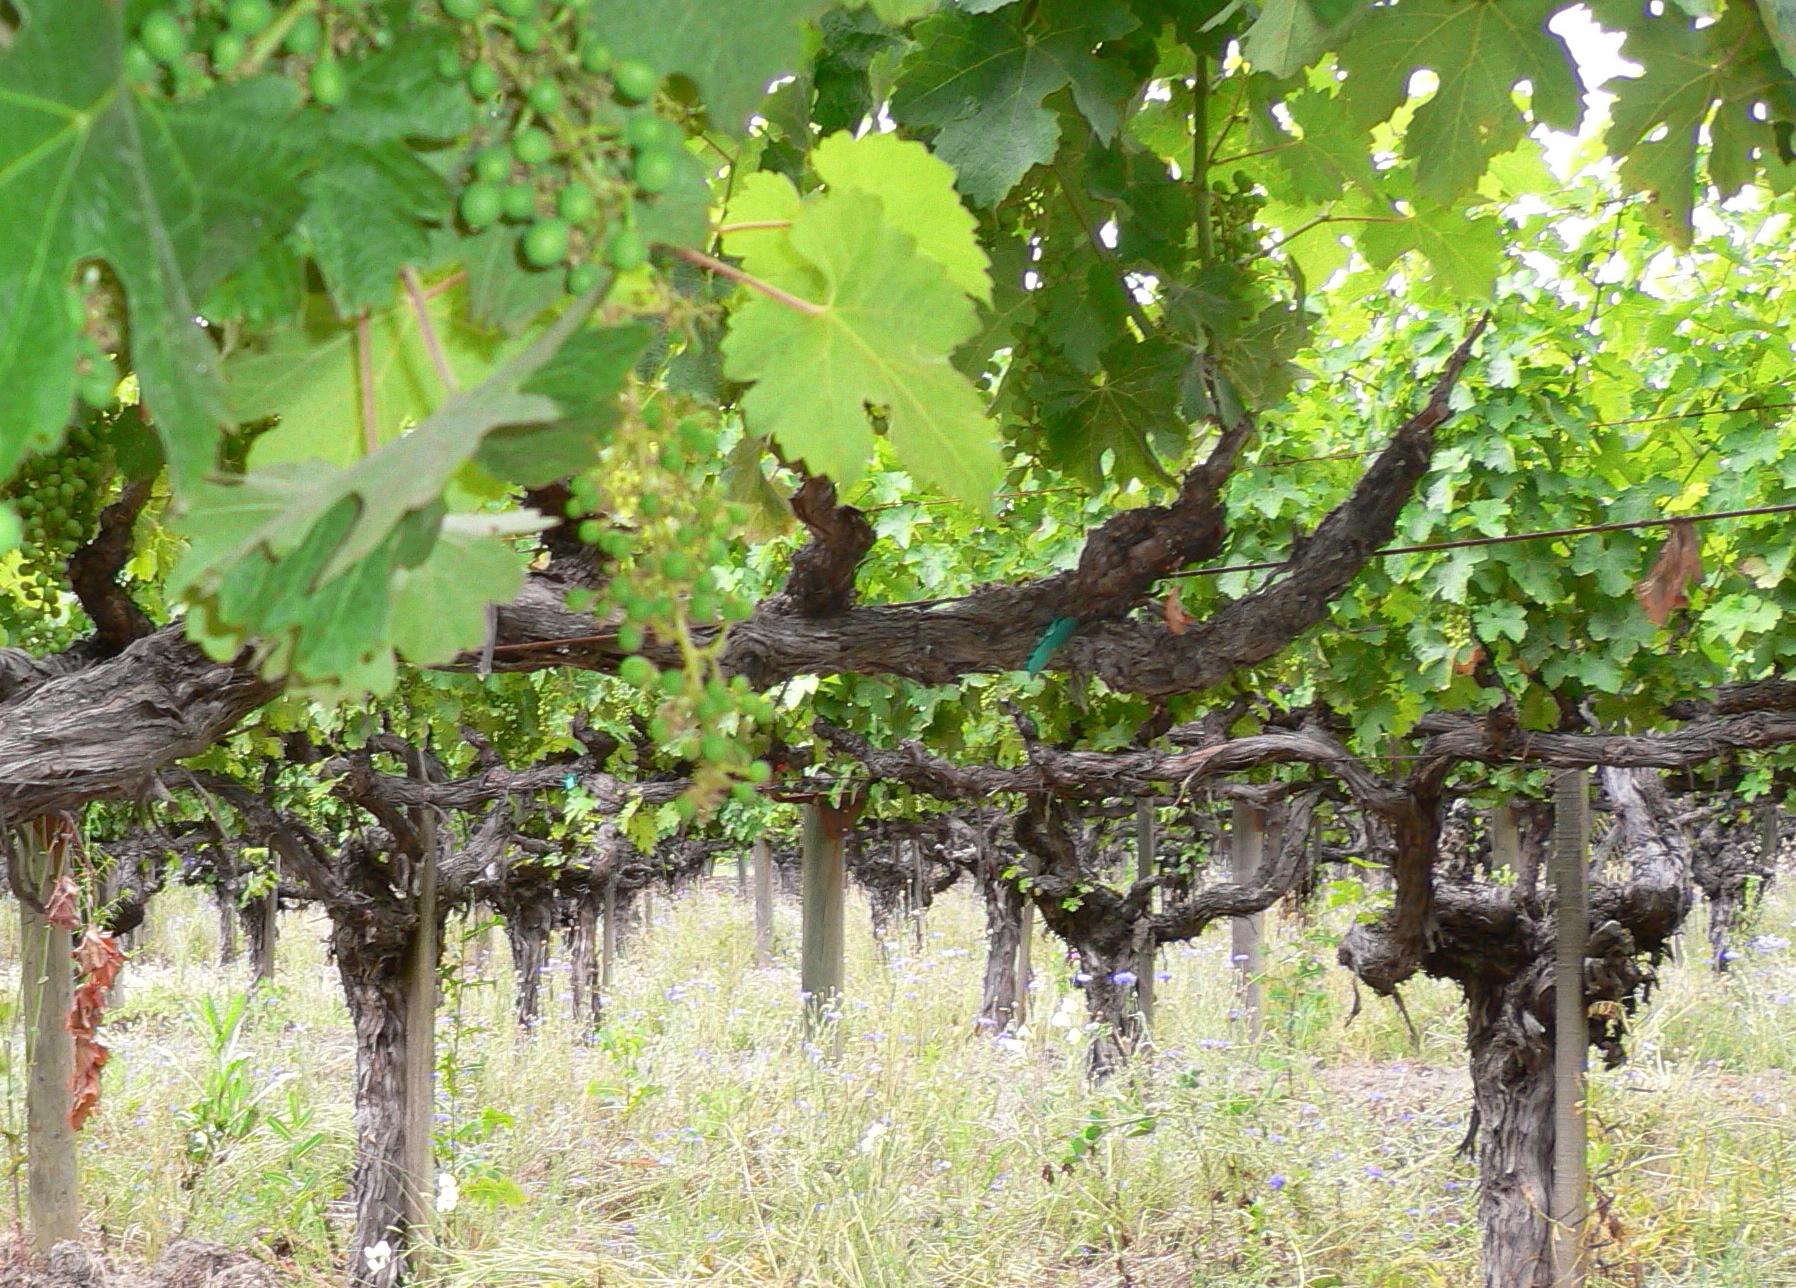 File:Old vine cabernet.jpg - Wikimedia Commons